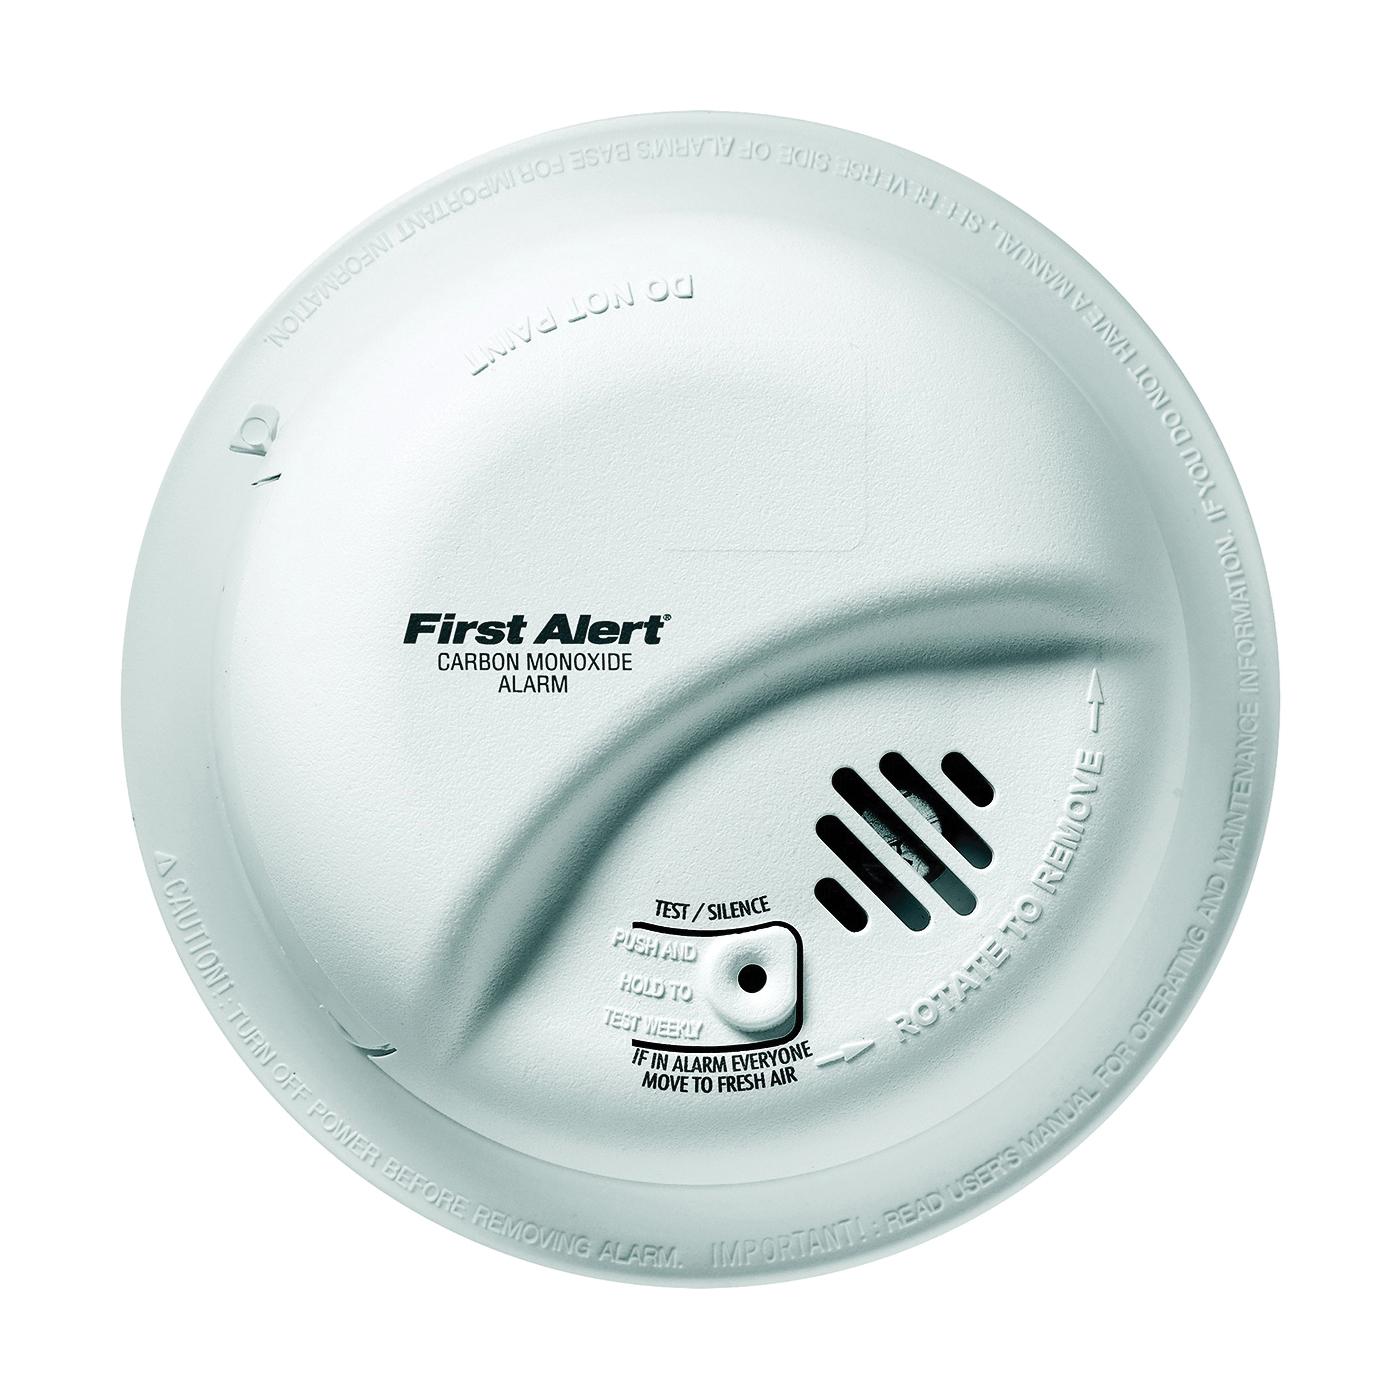 Picture of FIRST ALERT CO5120BN Carbon Monoxide Alarm, 10 ft, 85 dB, Alarm: Audible, Electrochemical Sensor